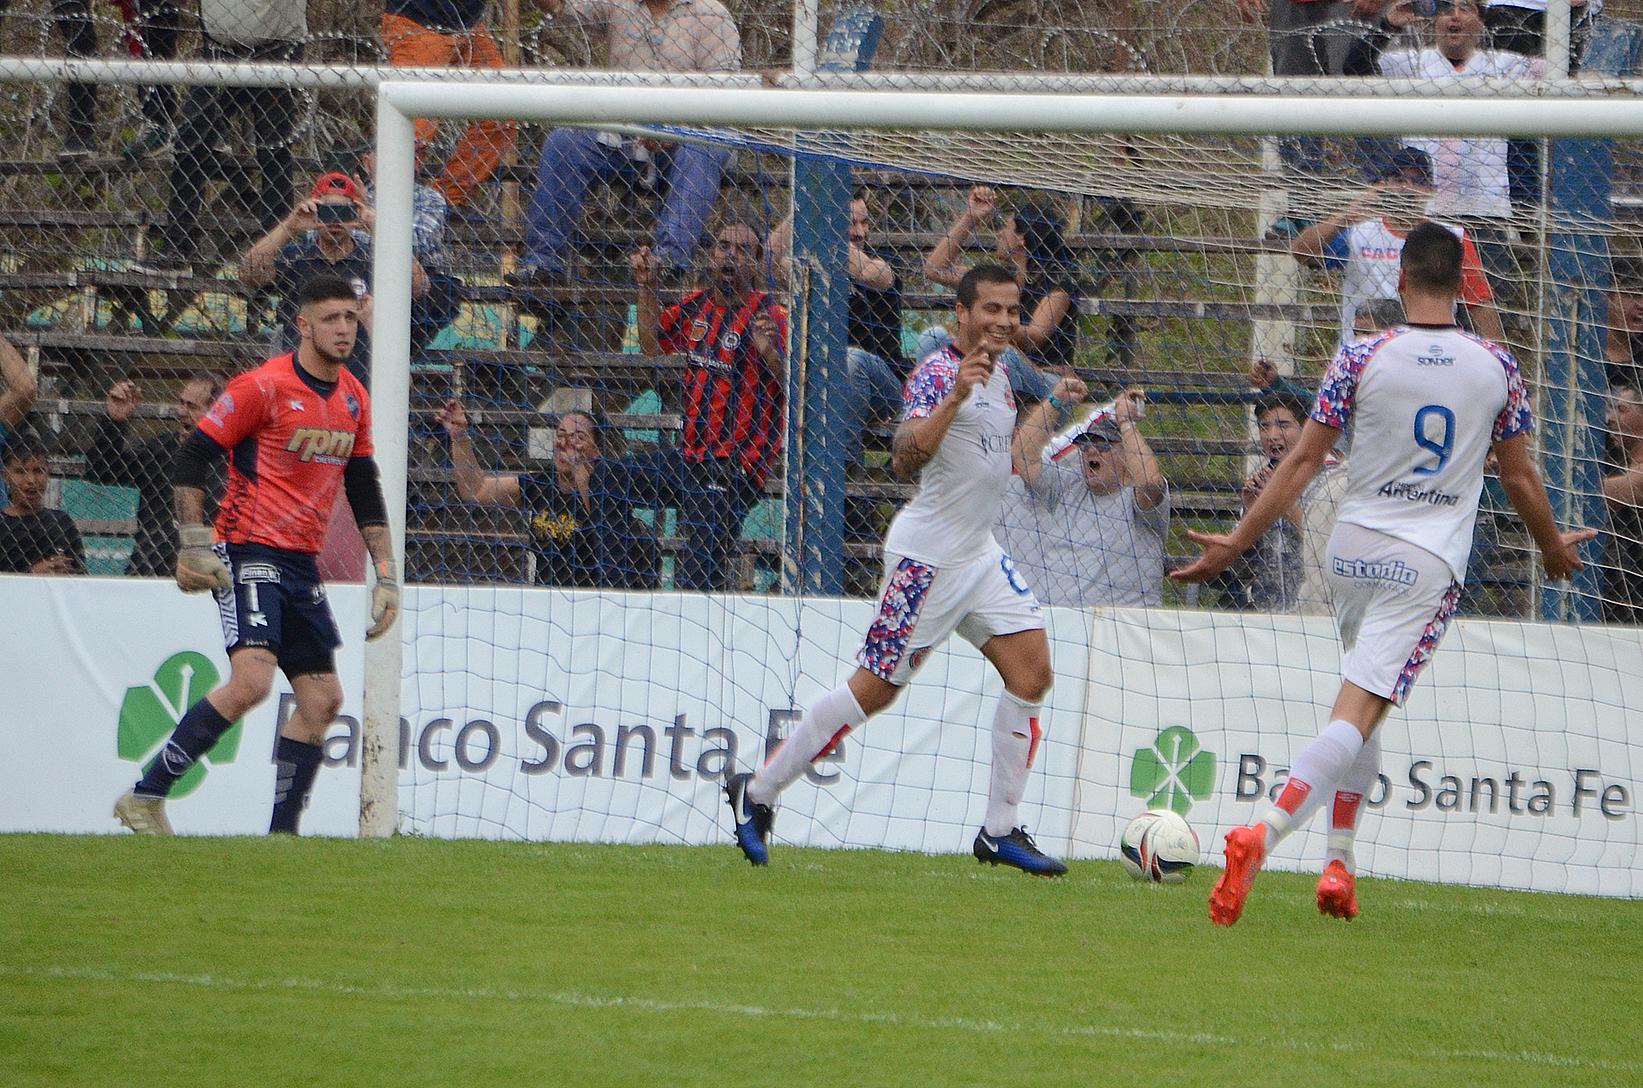 FOTO M. LIOTTA FESTEJO. / Lucas Lazo ya anotó, de penal, y celebra el gol que le terminó dando la victoria a Central Córdoba en Rafaela.